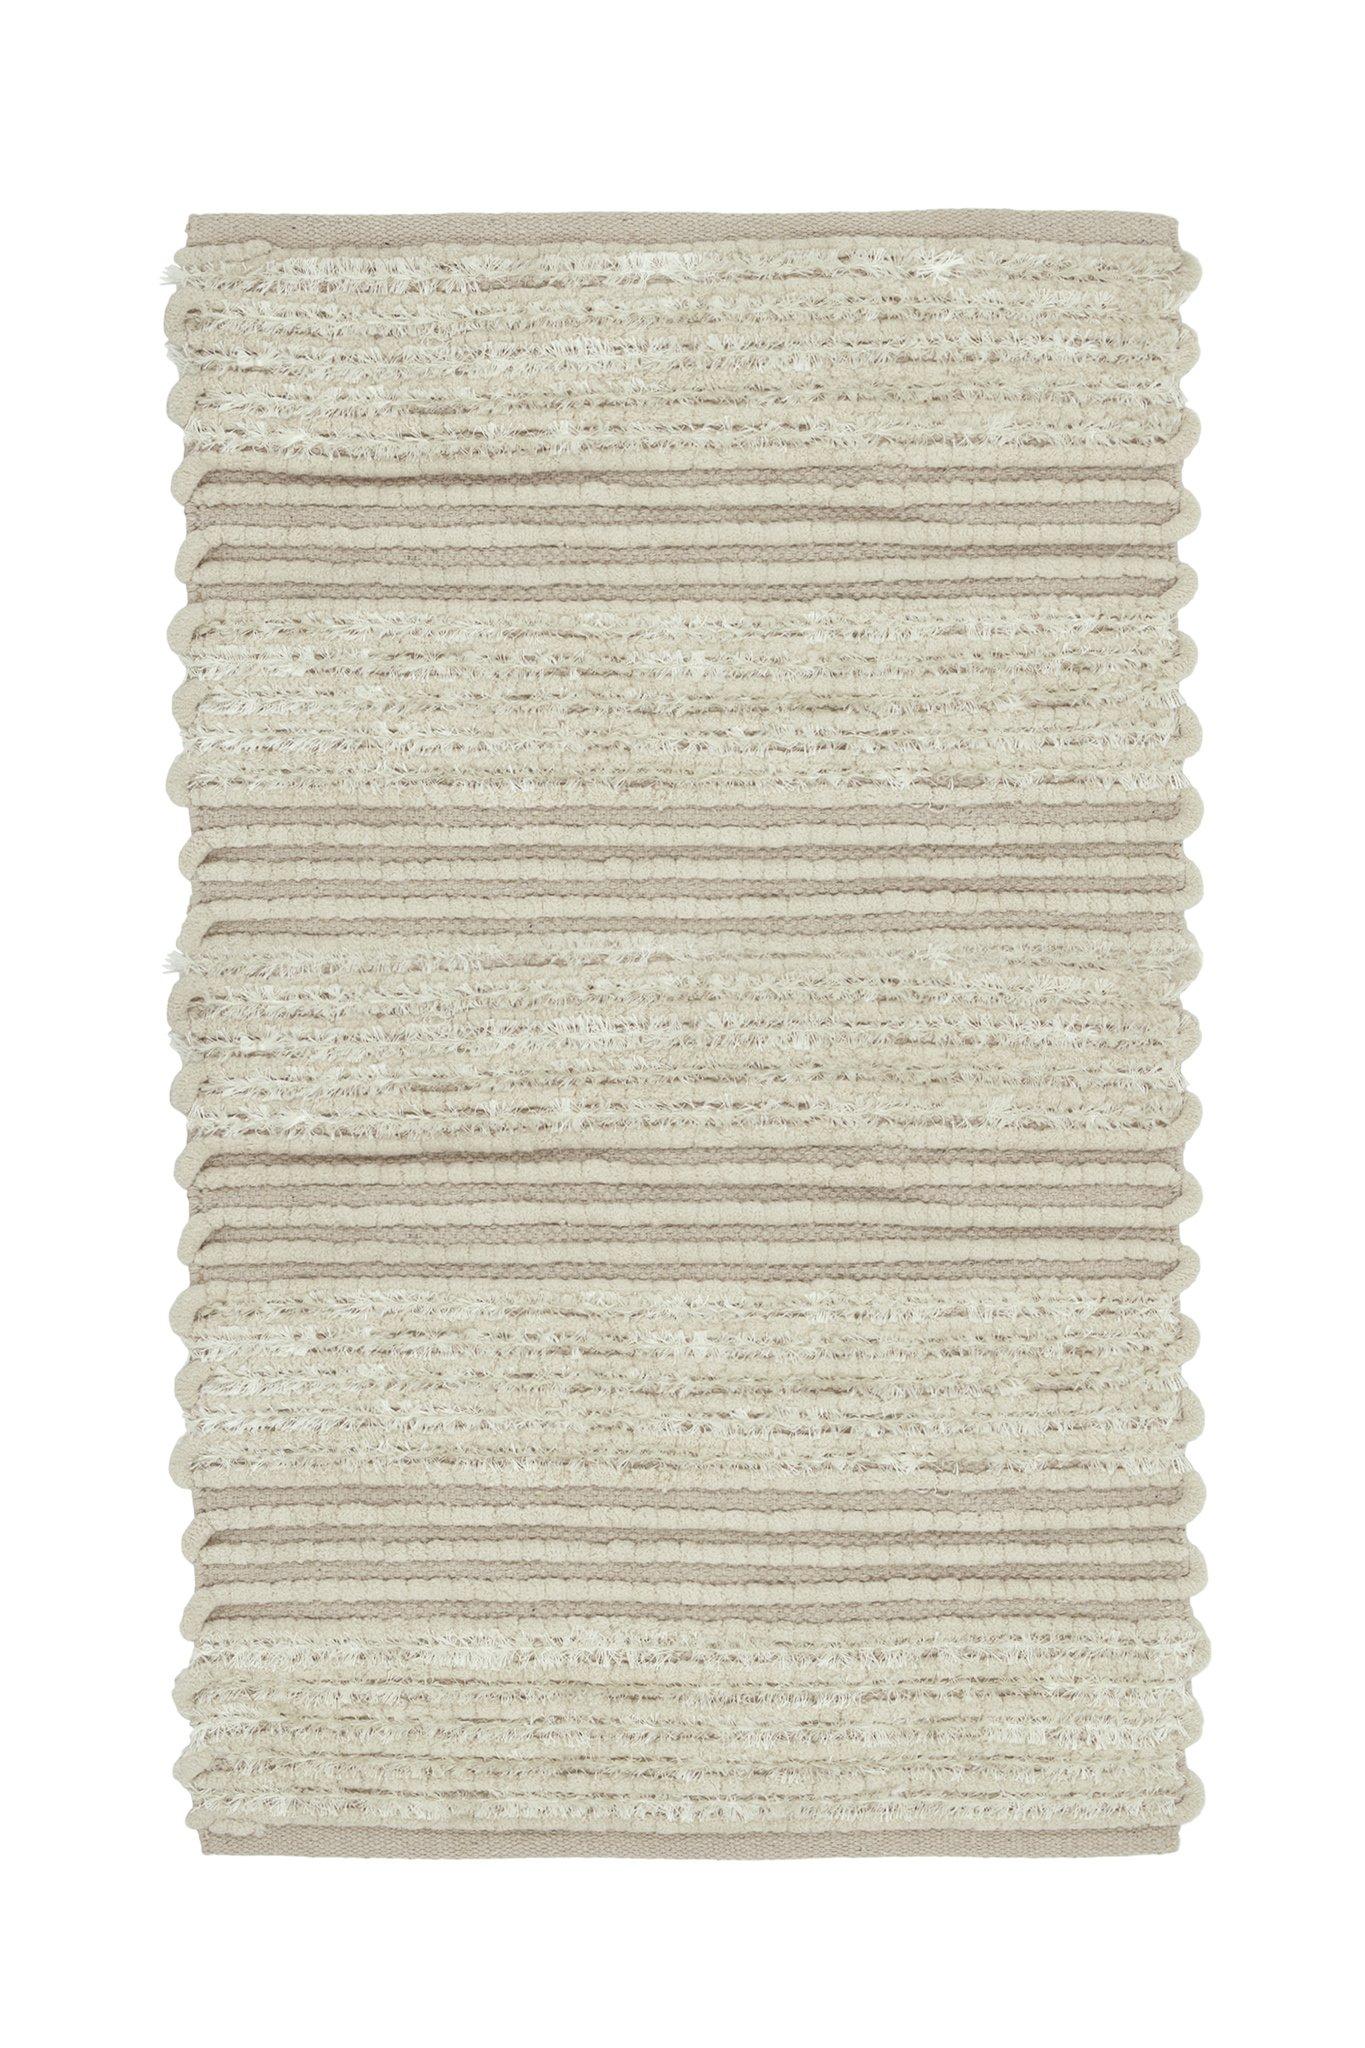 Solange Badematte 70x120 Naturel